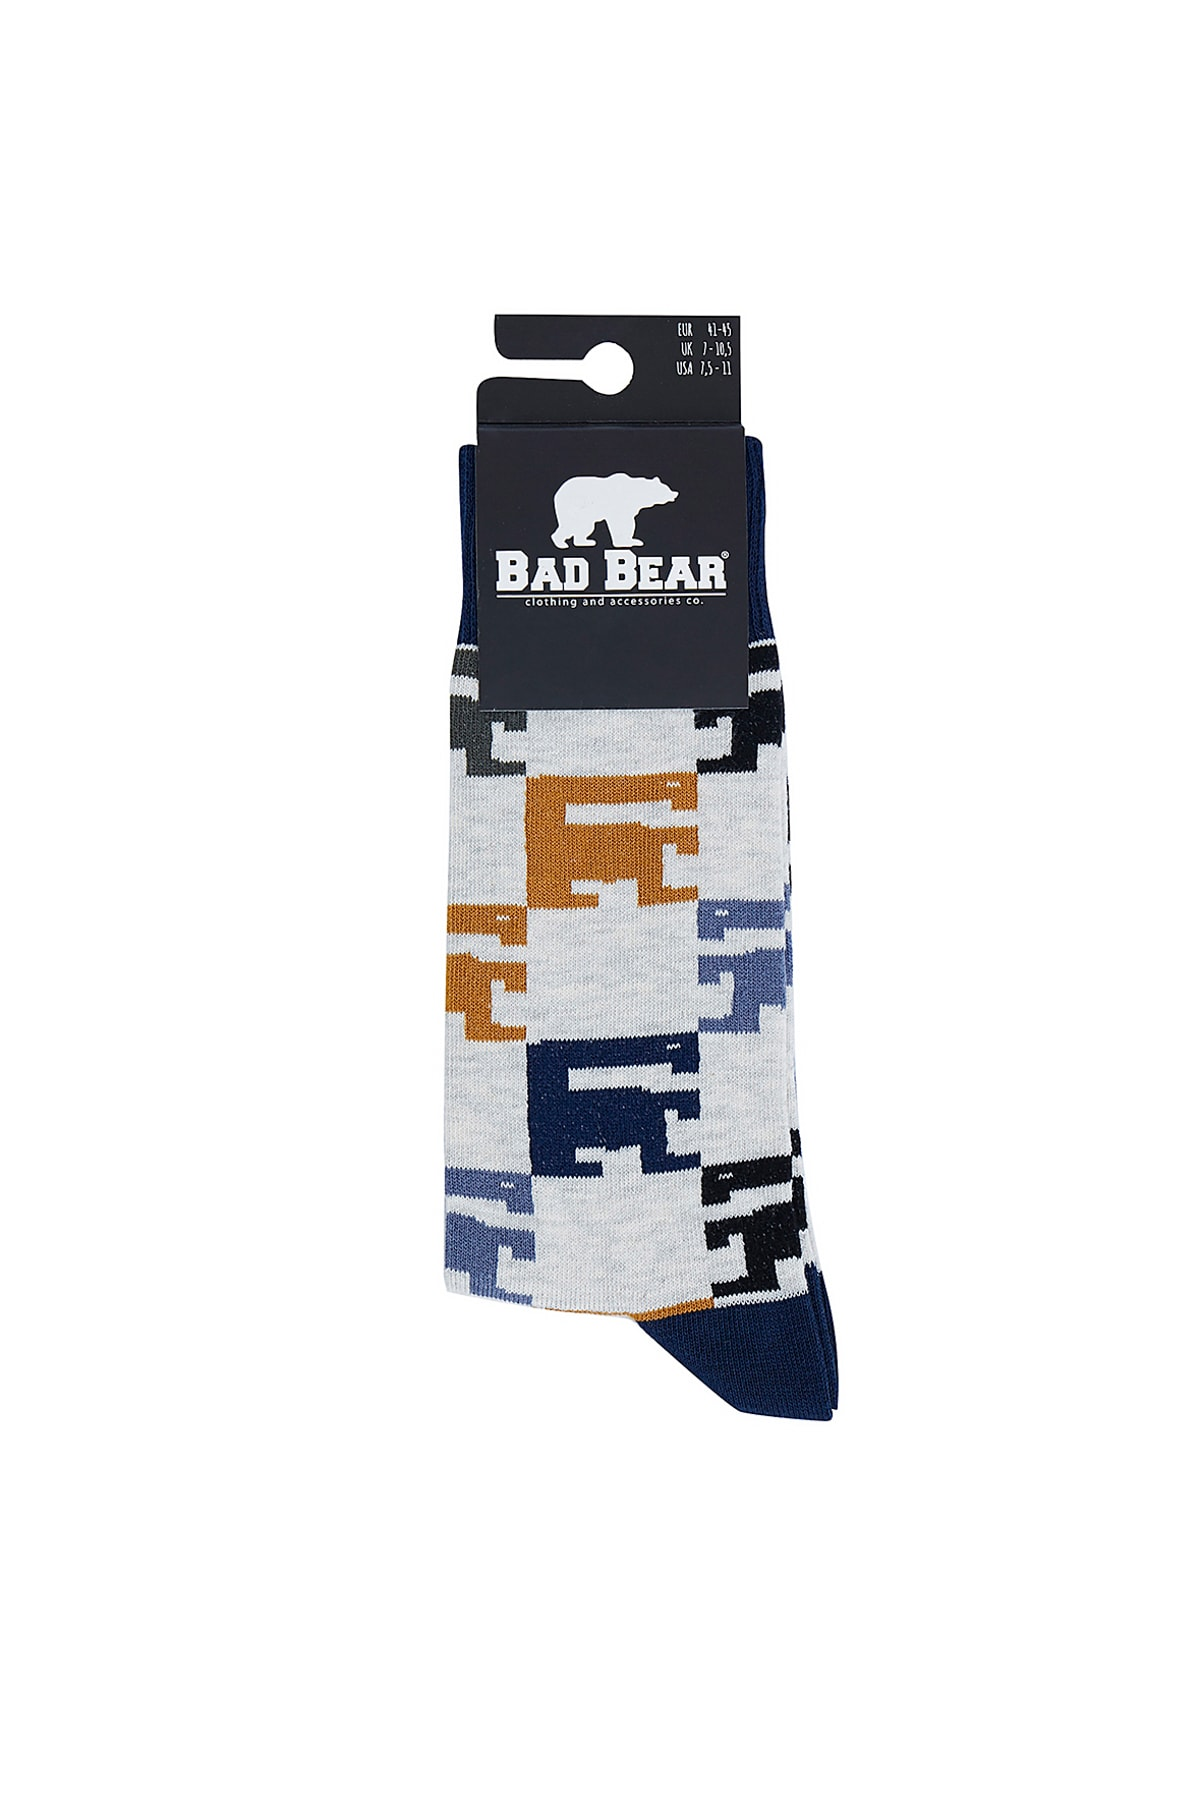 Bad Bear Gri Erkek Çorap RECK TALL GRAYMELANGE 2